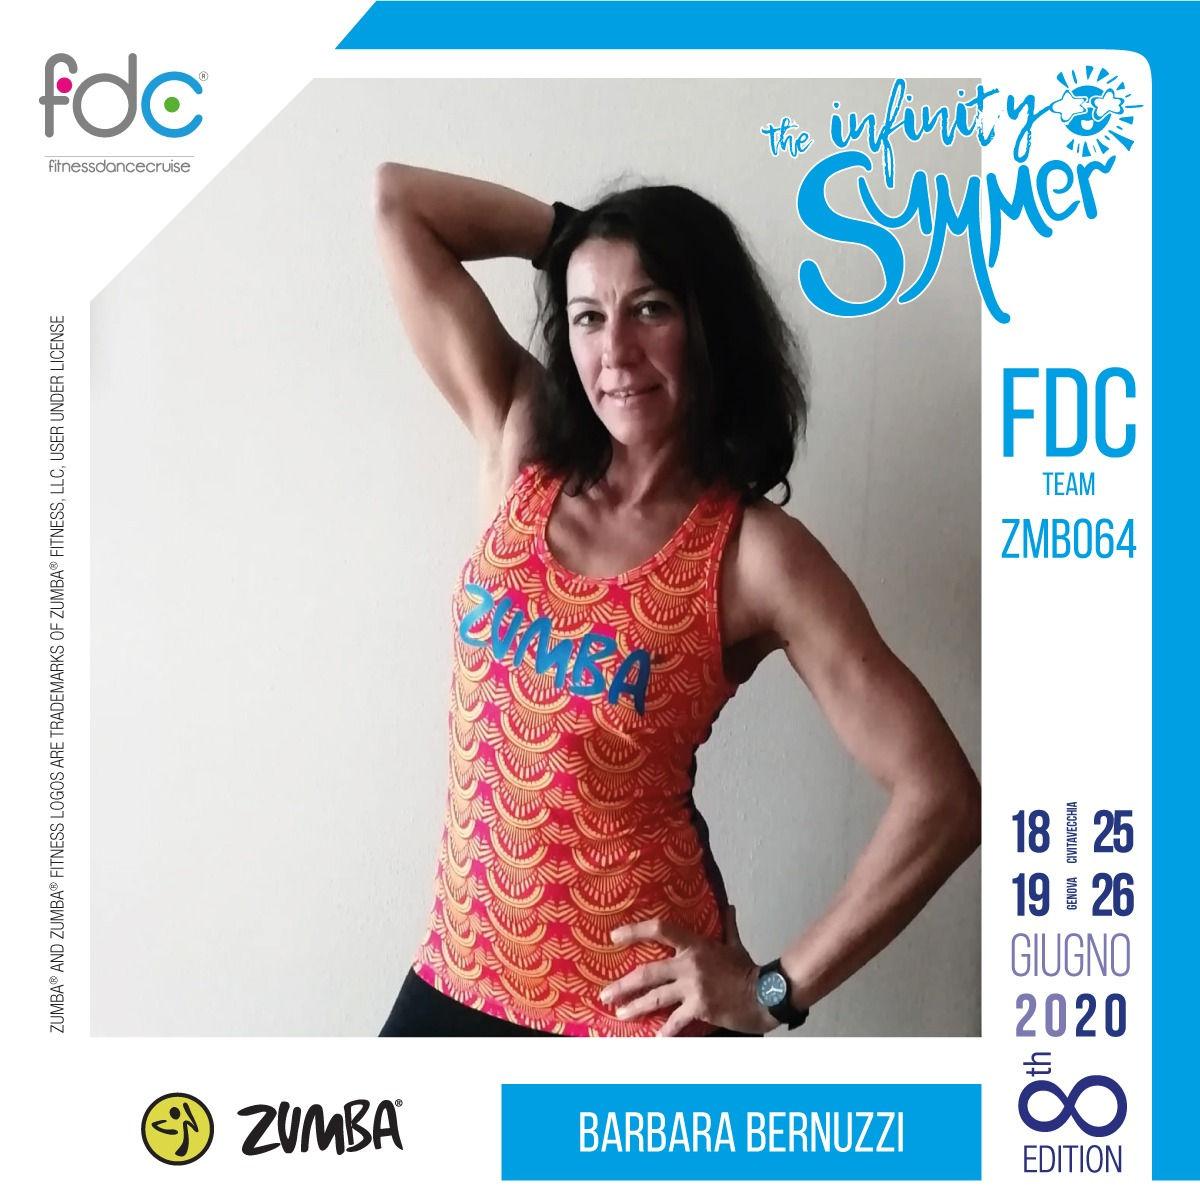 FDC Team Barbara Bernuzzi